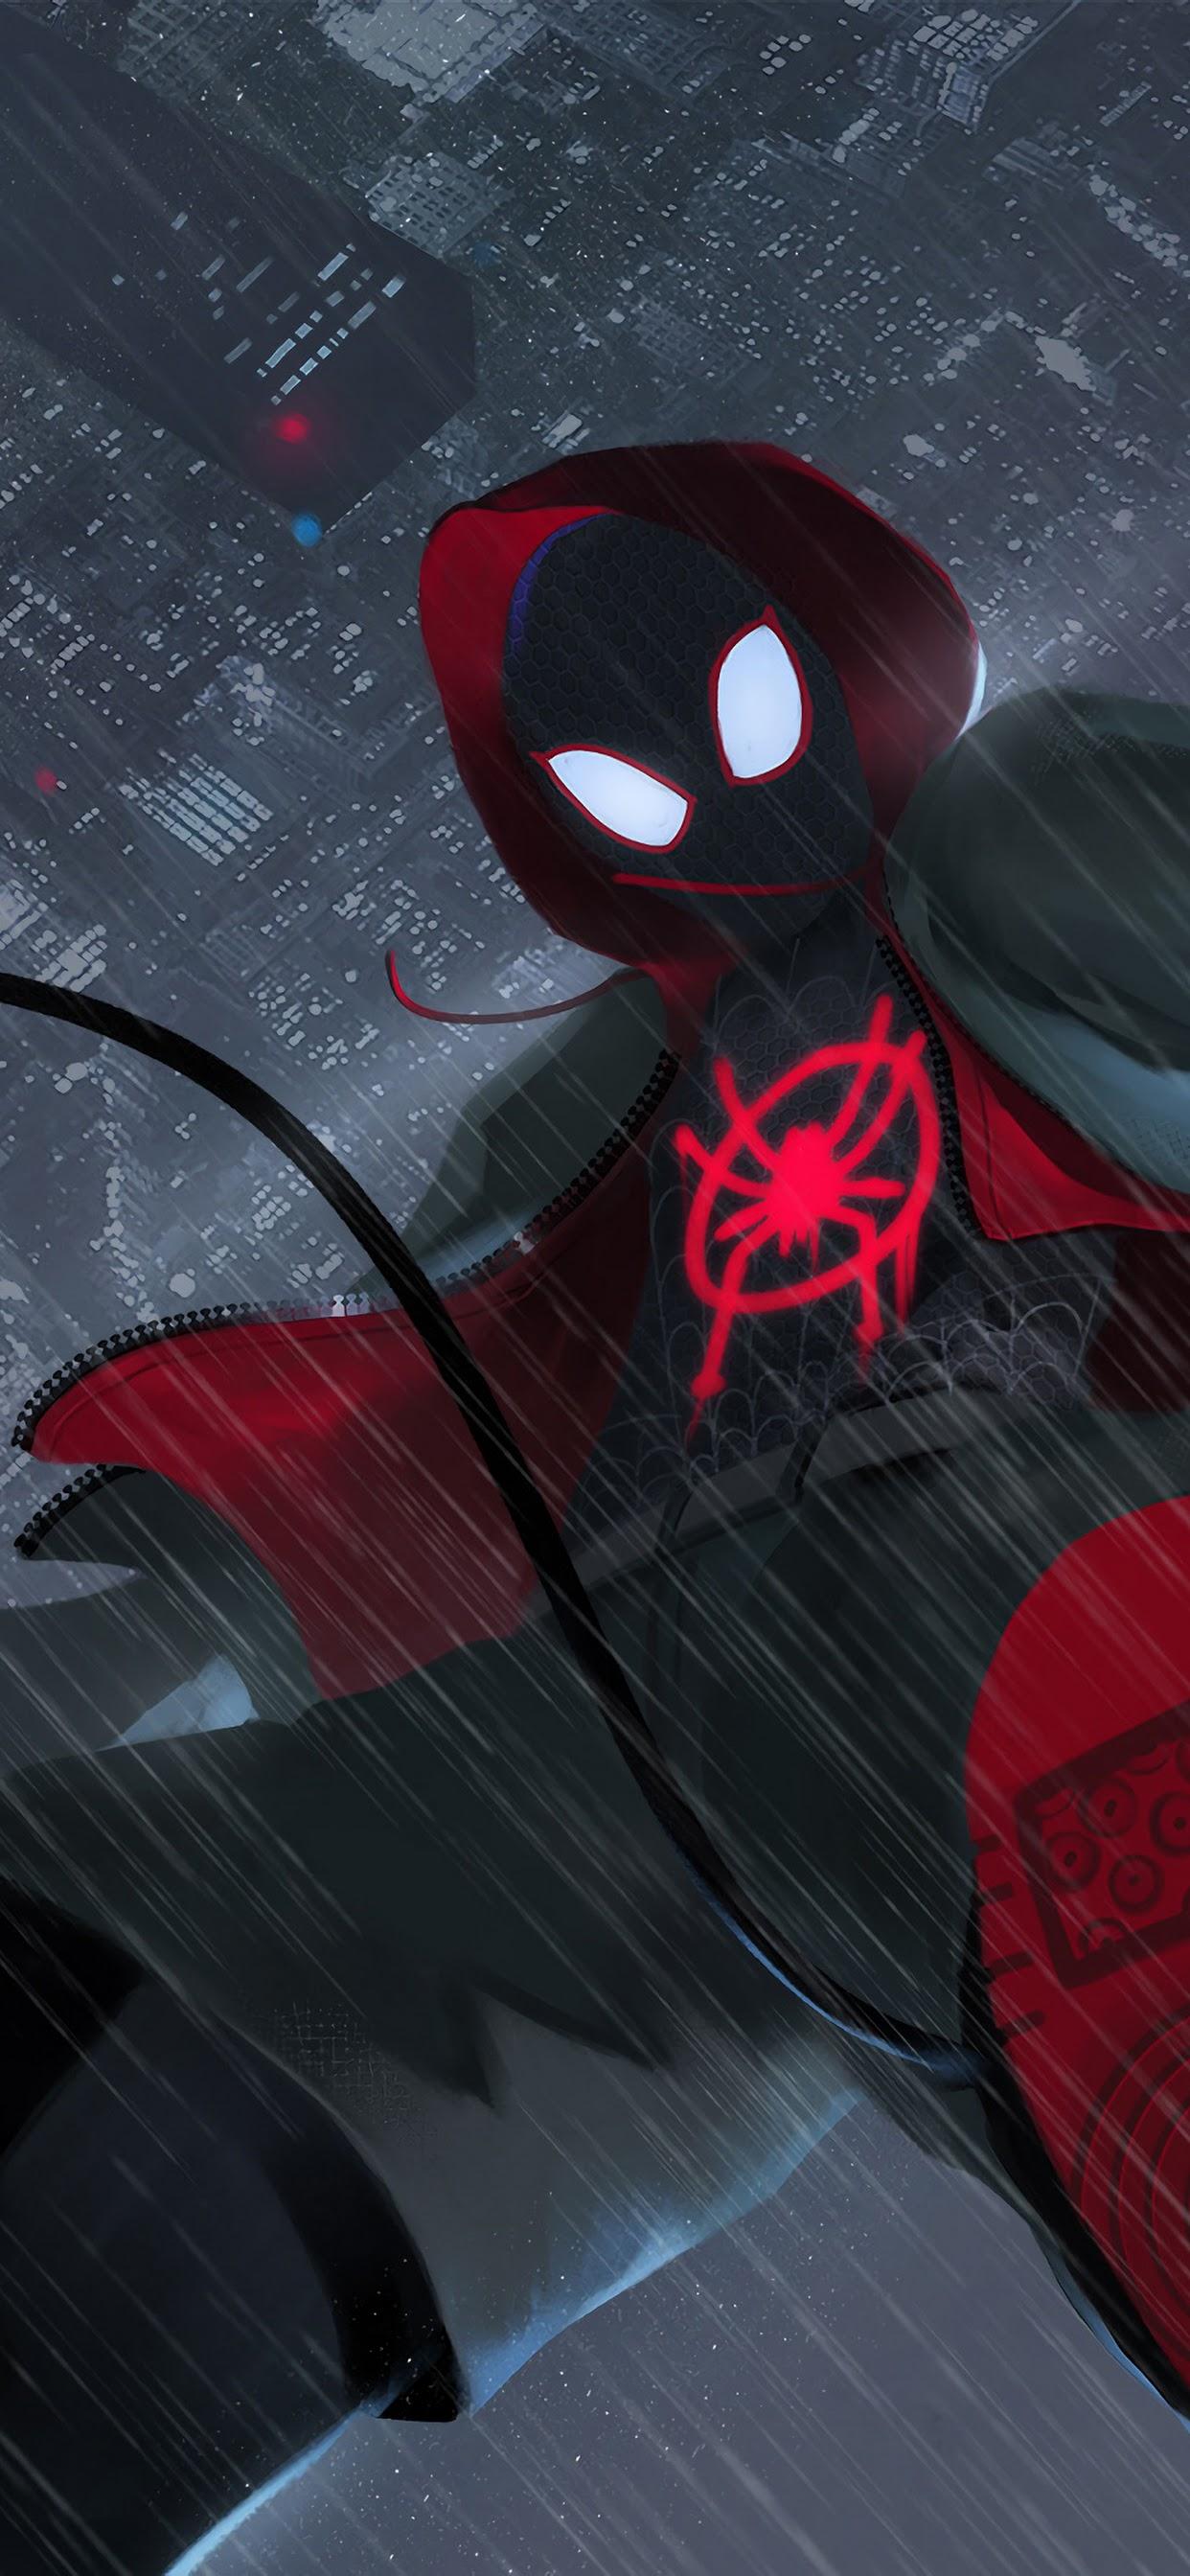 Spiderman Wallpaper Iphone 11 Pro Max